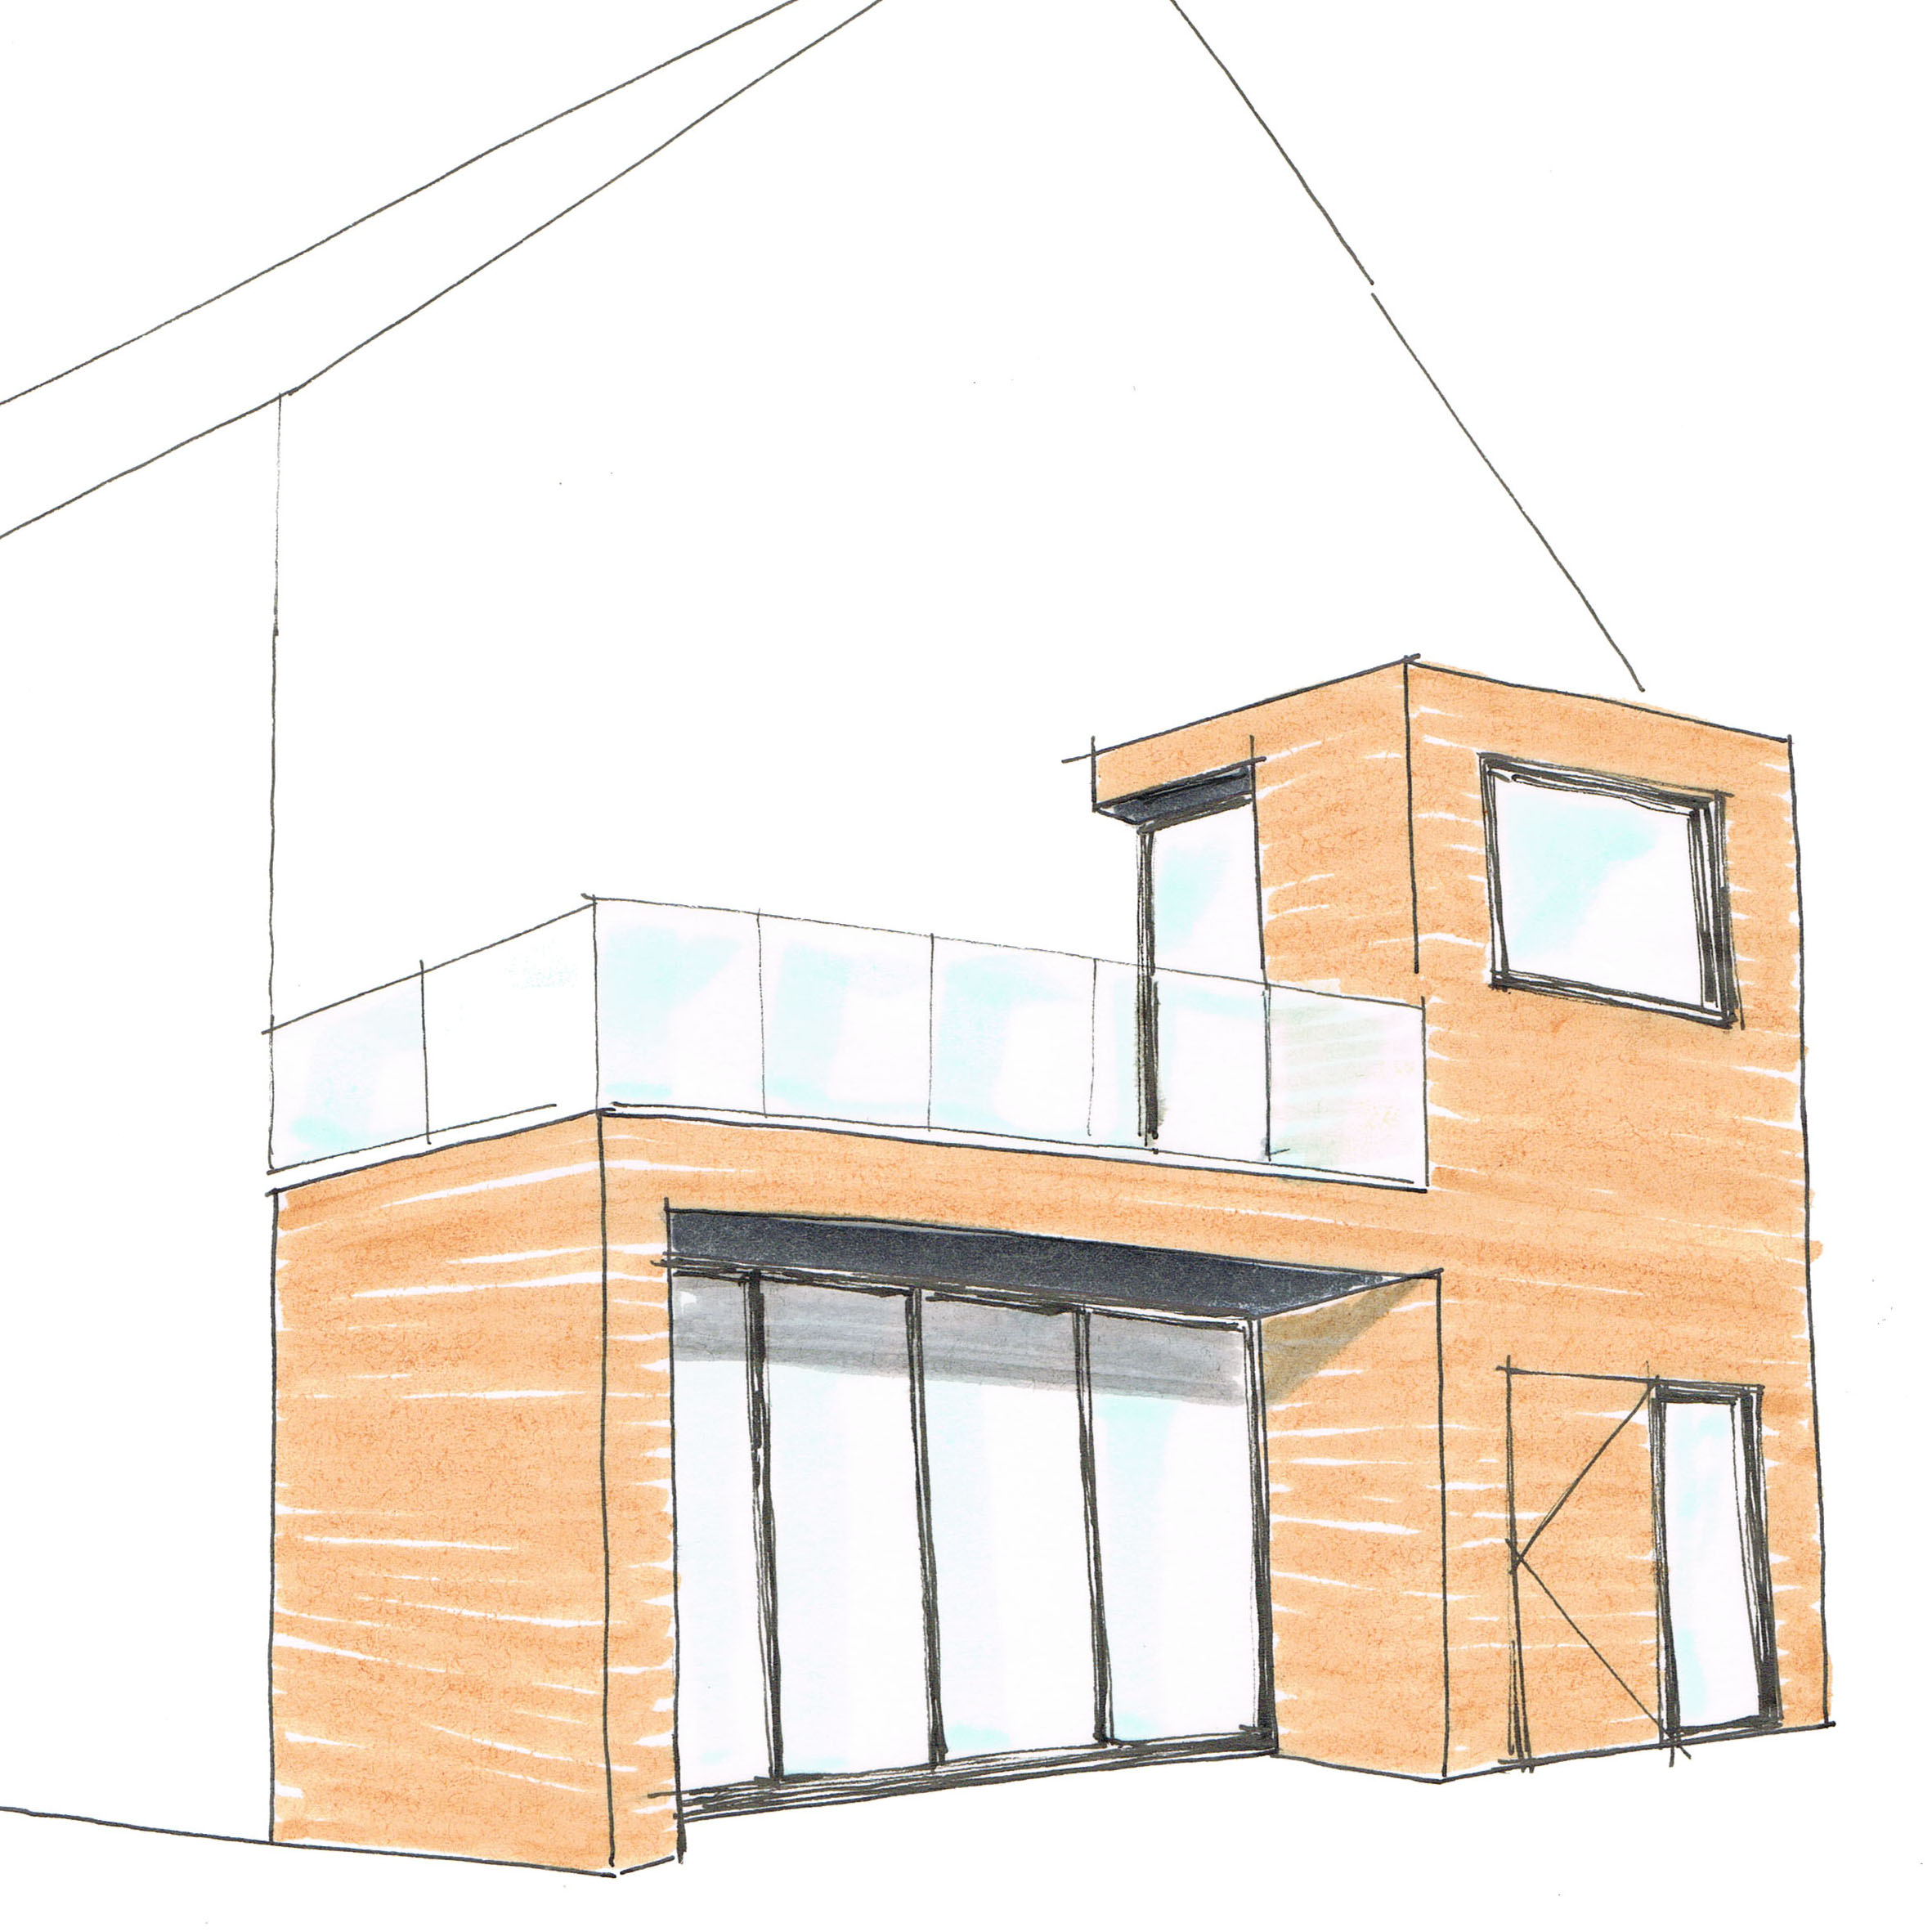 stoel_architect_kampen_stoelaantafel (2)